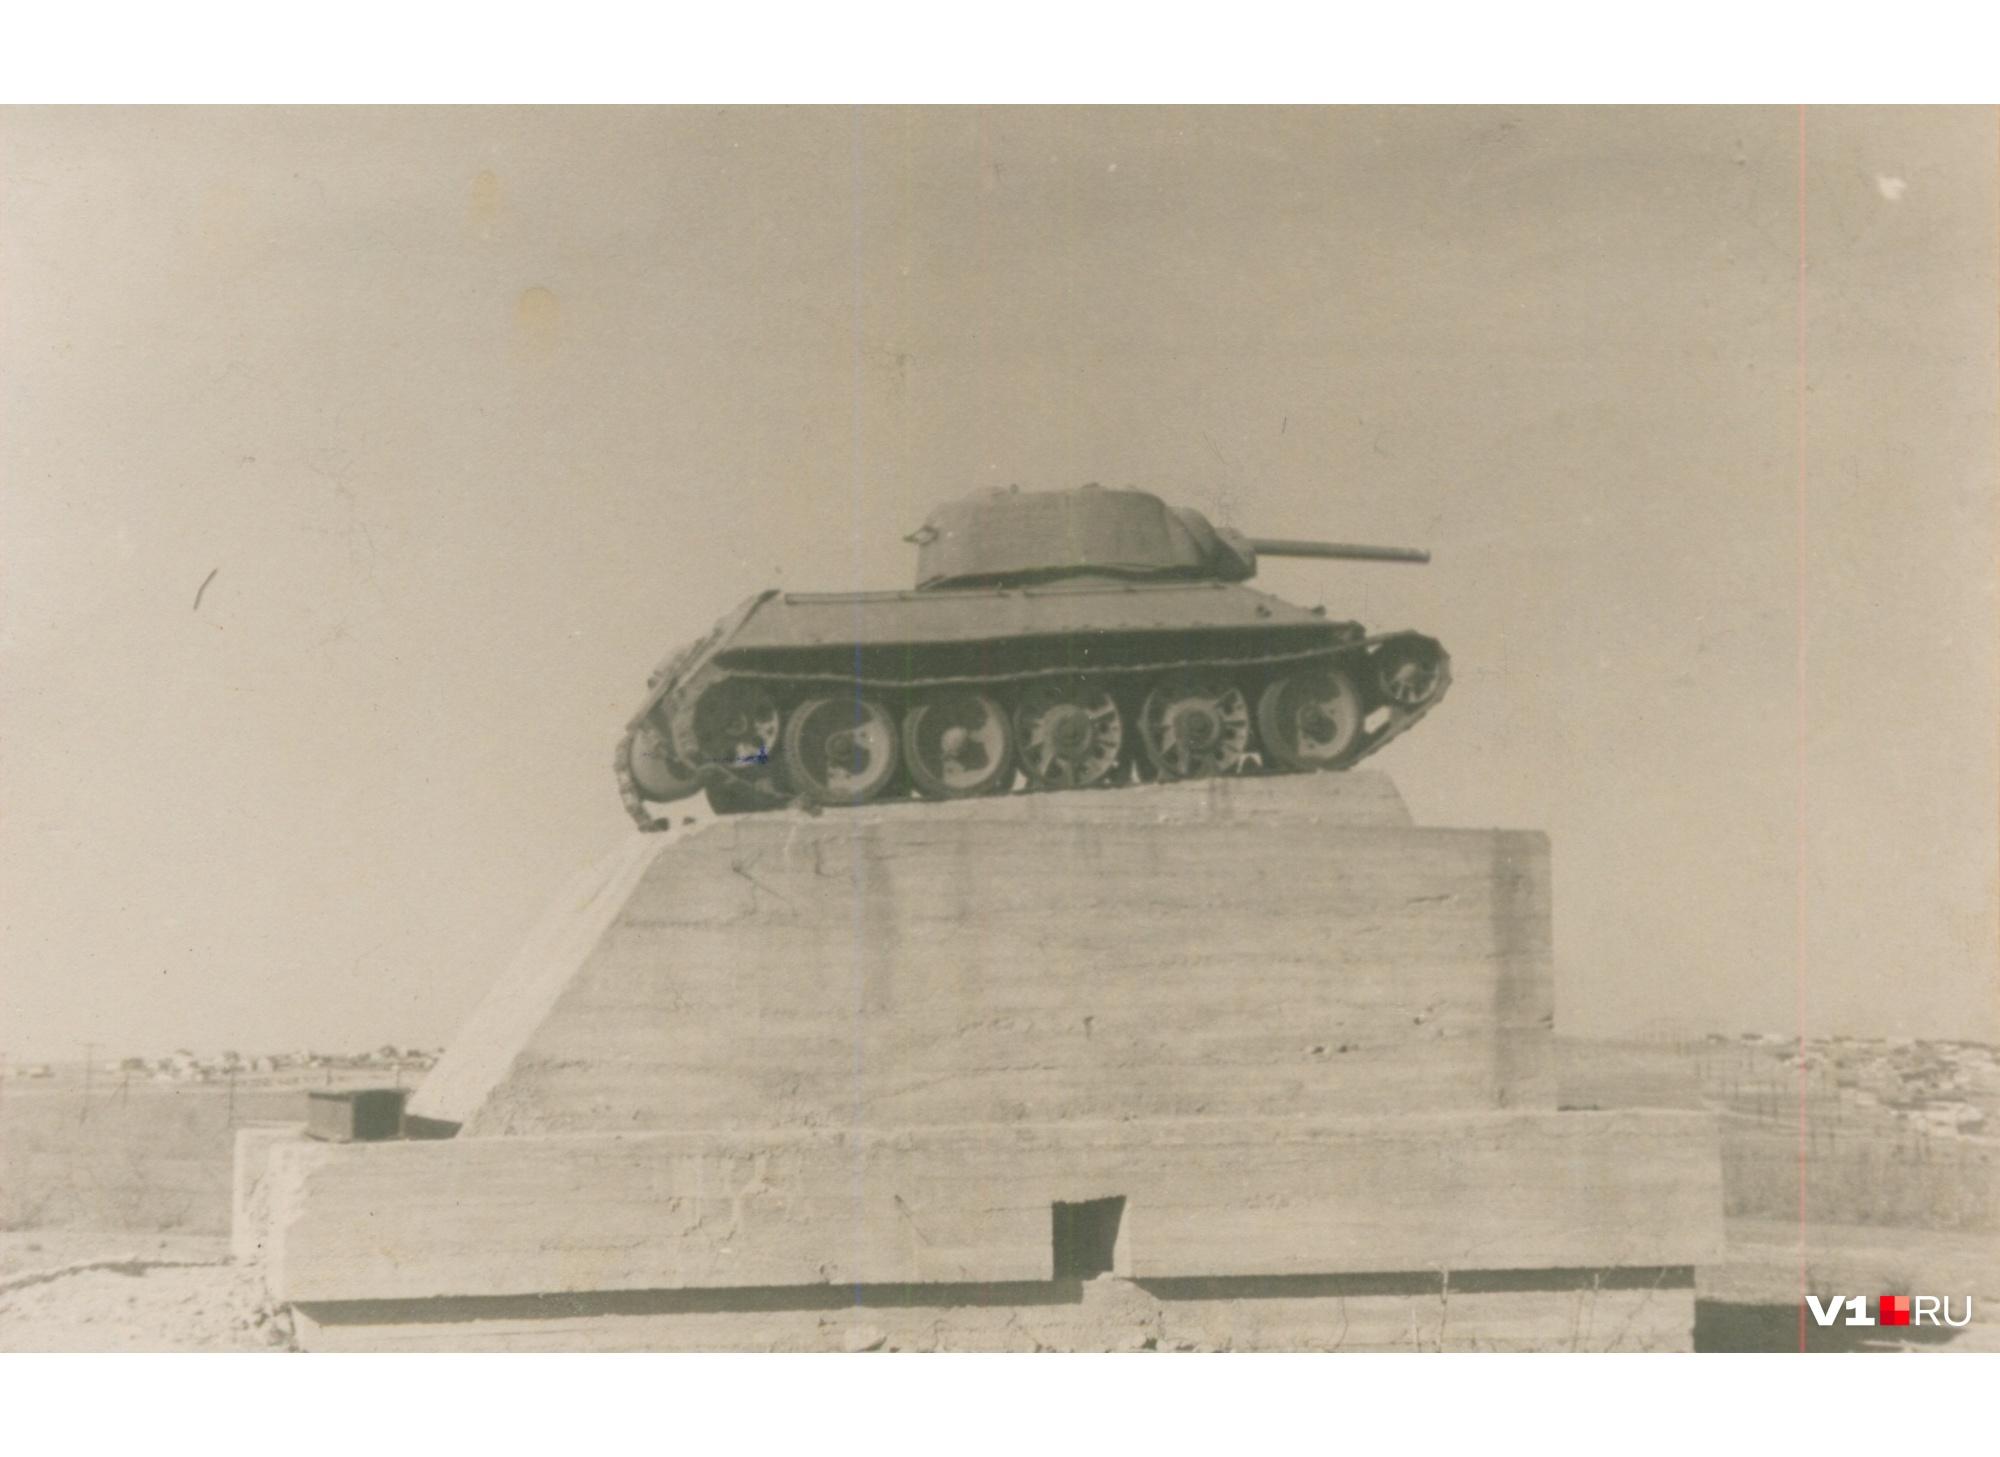 Вначале пушка подбитого танка была опущена вниз